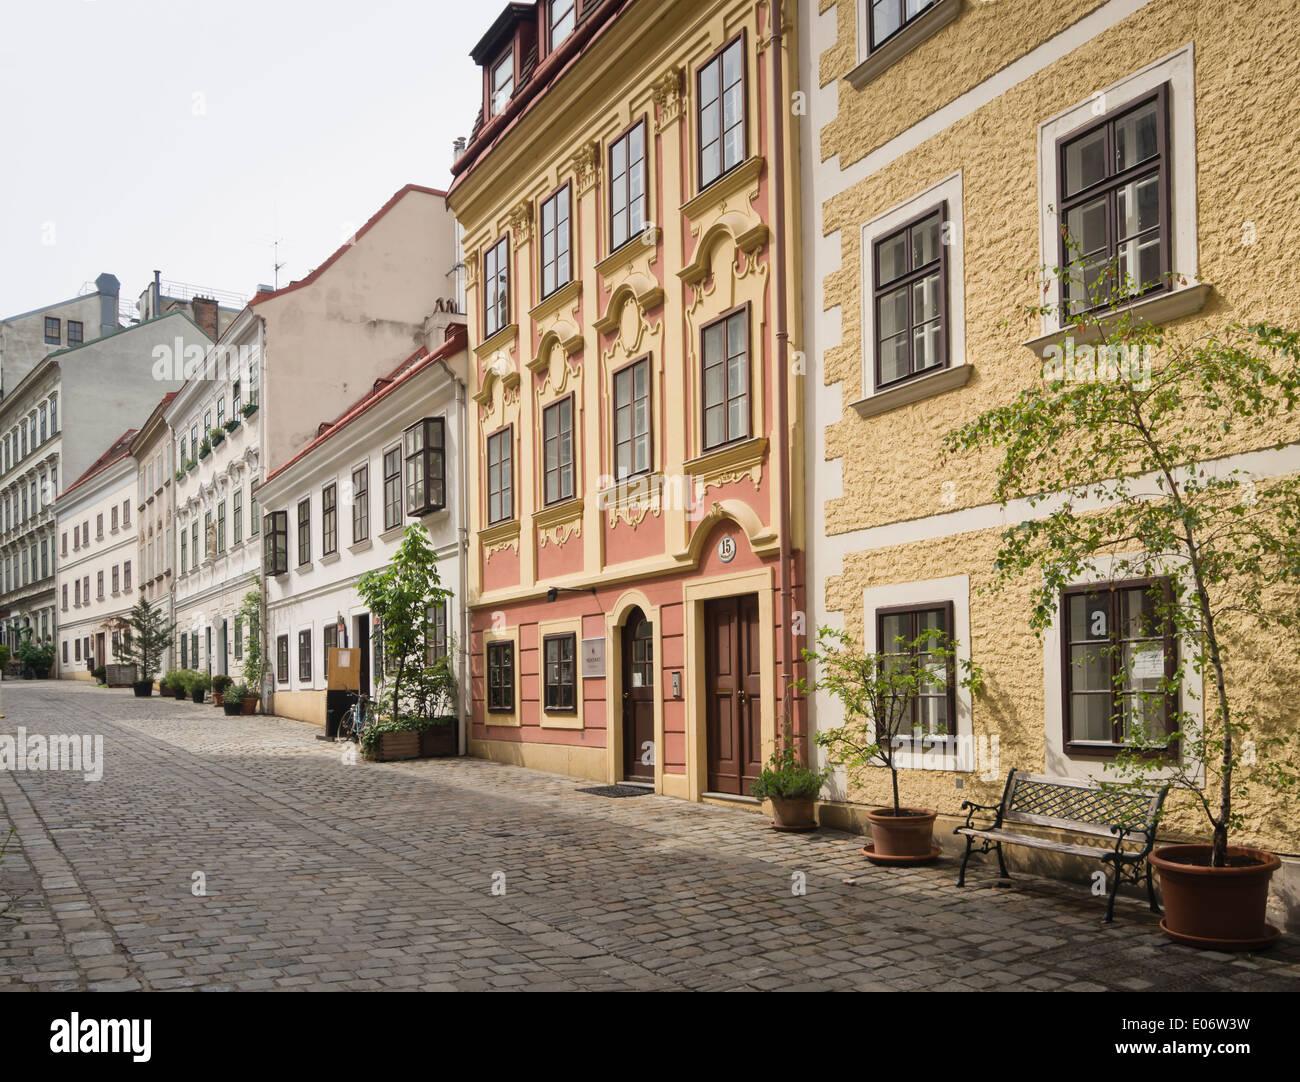 Narrow cobbled street with old house facades, Spittelberg Neubau ...